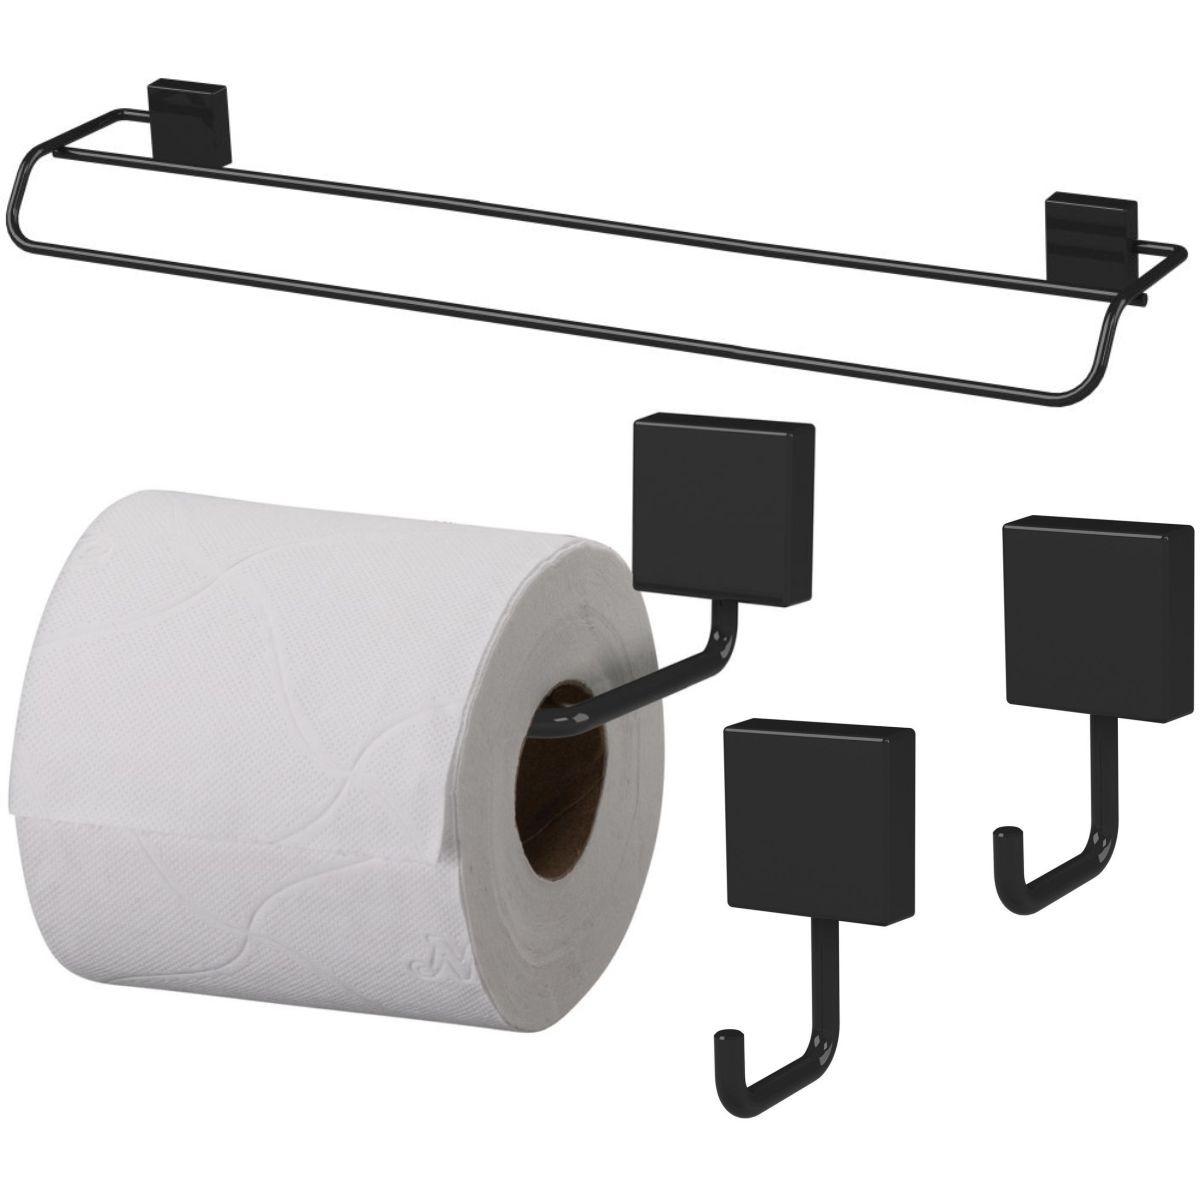 Kit Banheiro Organizadores Toalheiro 60cm Papeleira Gancho